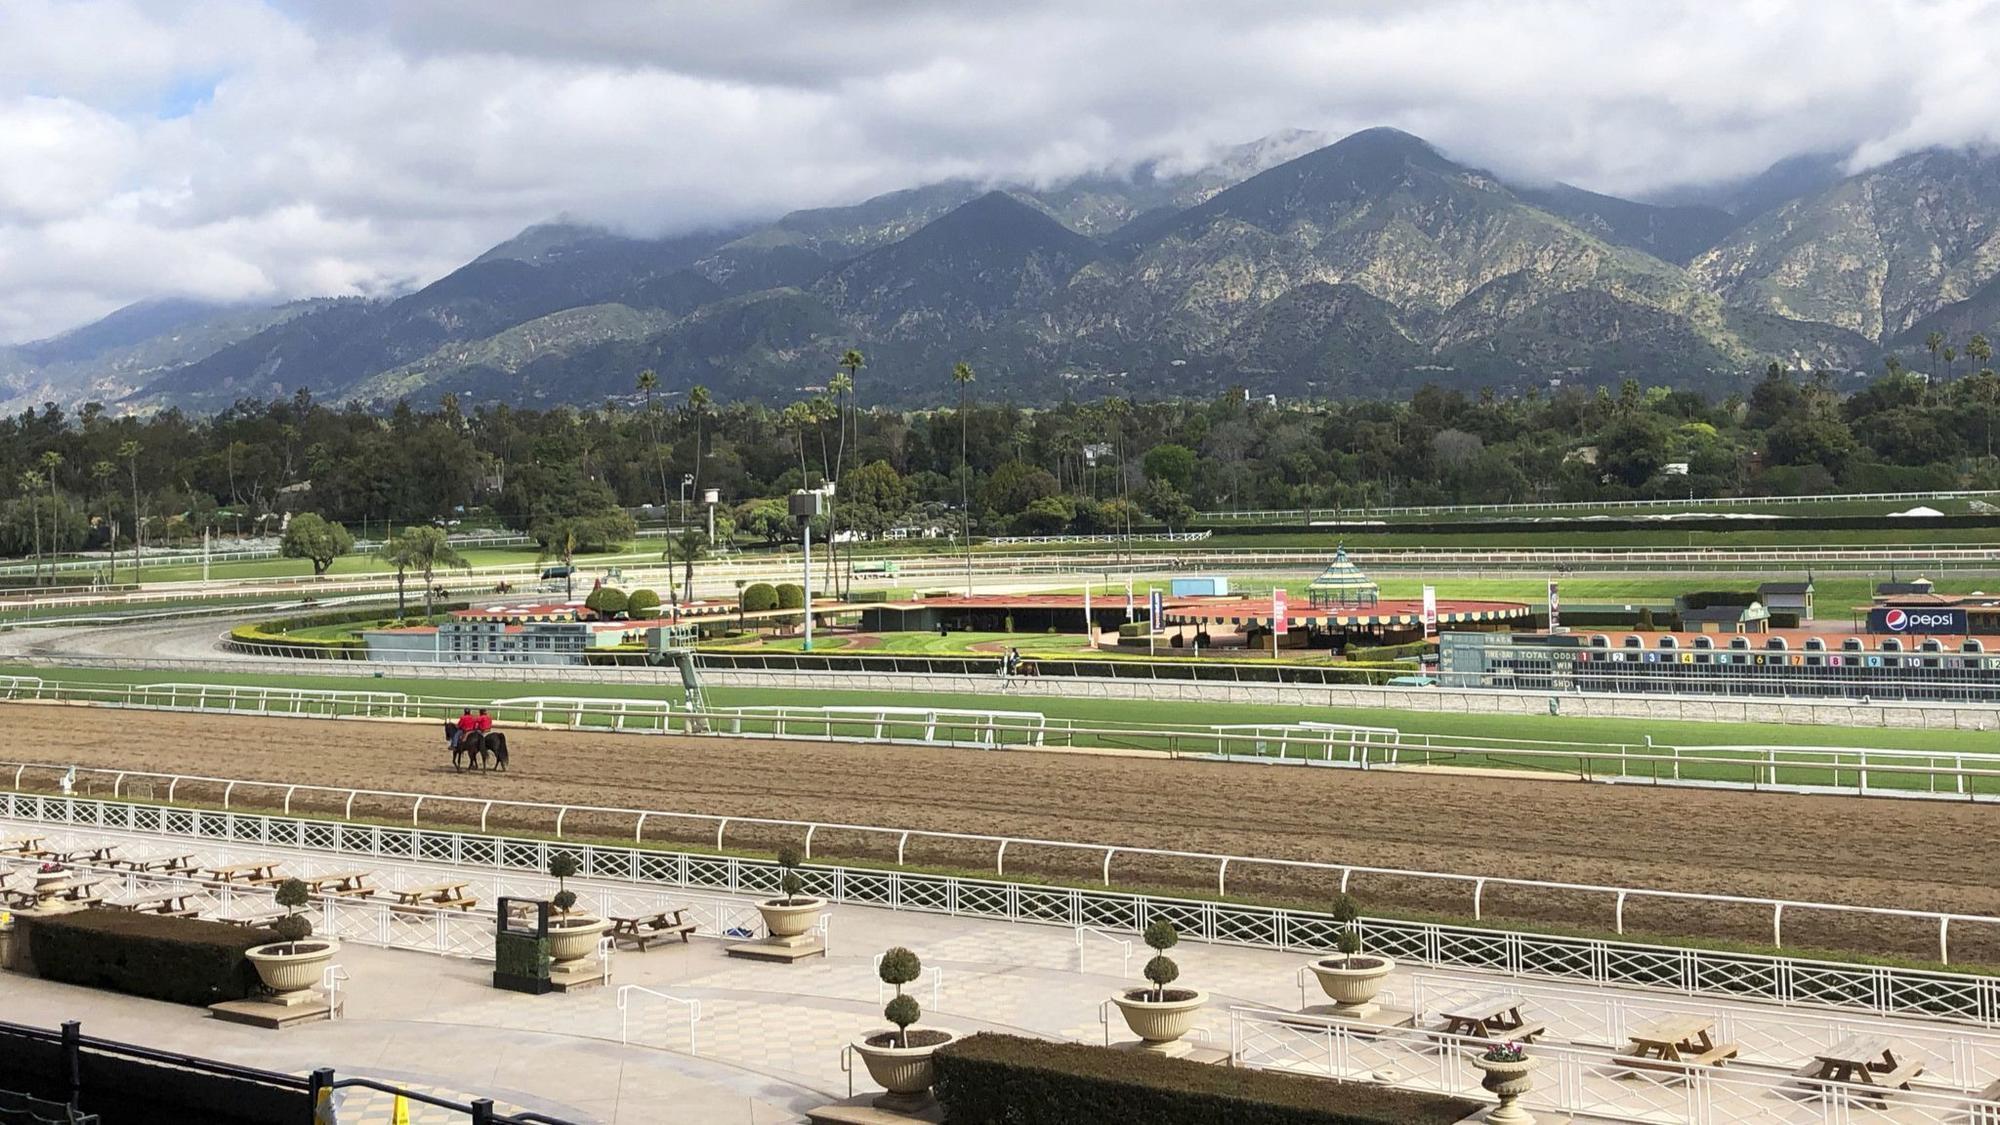 Another Horse Fatality At Santa Anita 24 Thoroughbreds